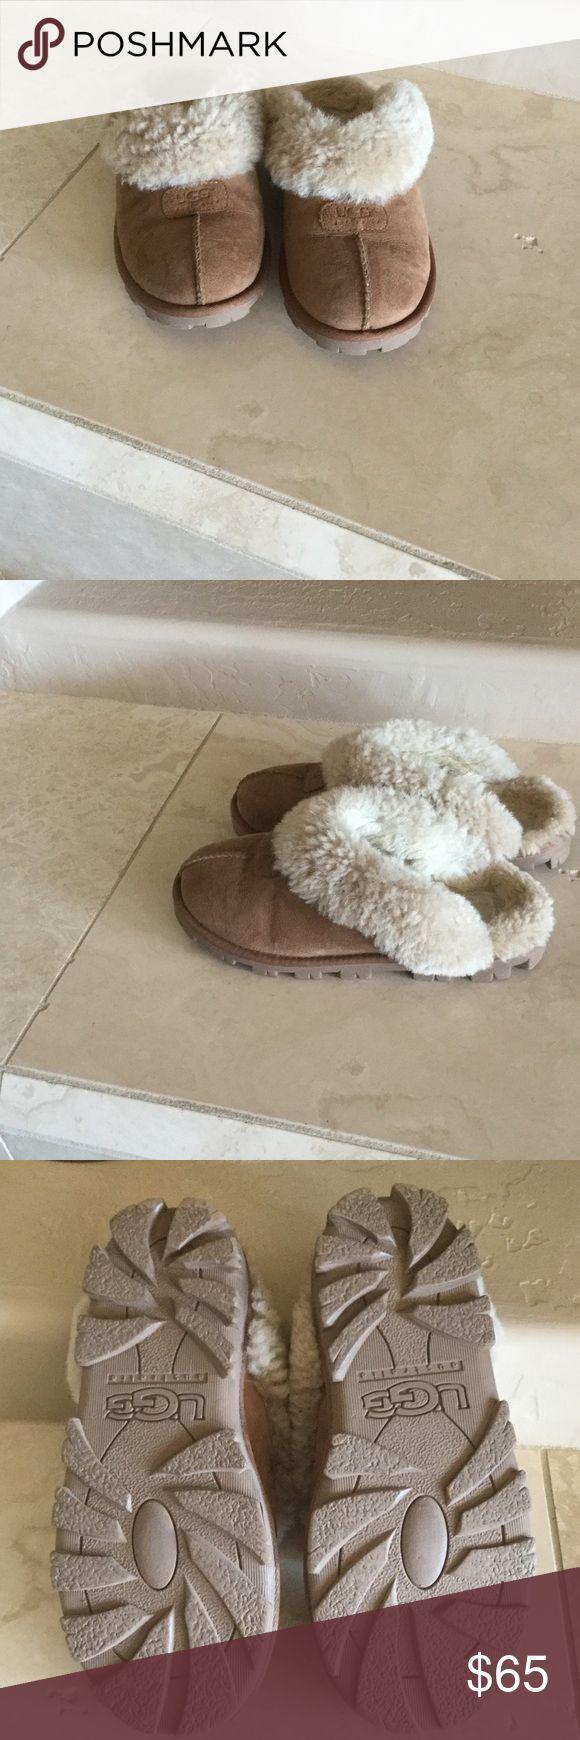 Ugg slippers Ugg slippers. Genuine shearling slipper. Color-Chestnut. UGG Shoes Slippers